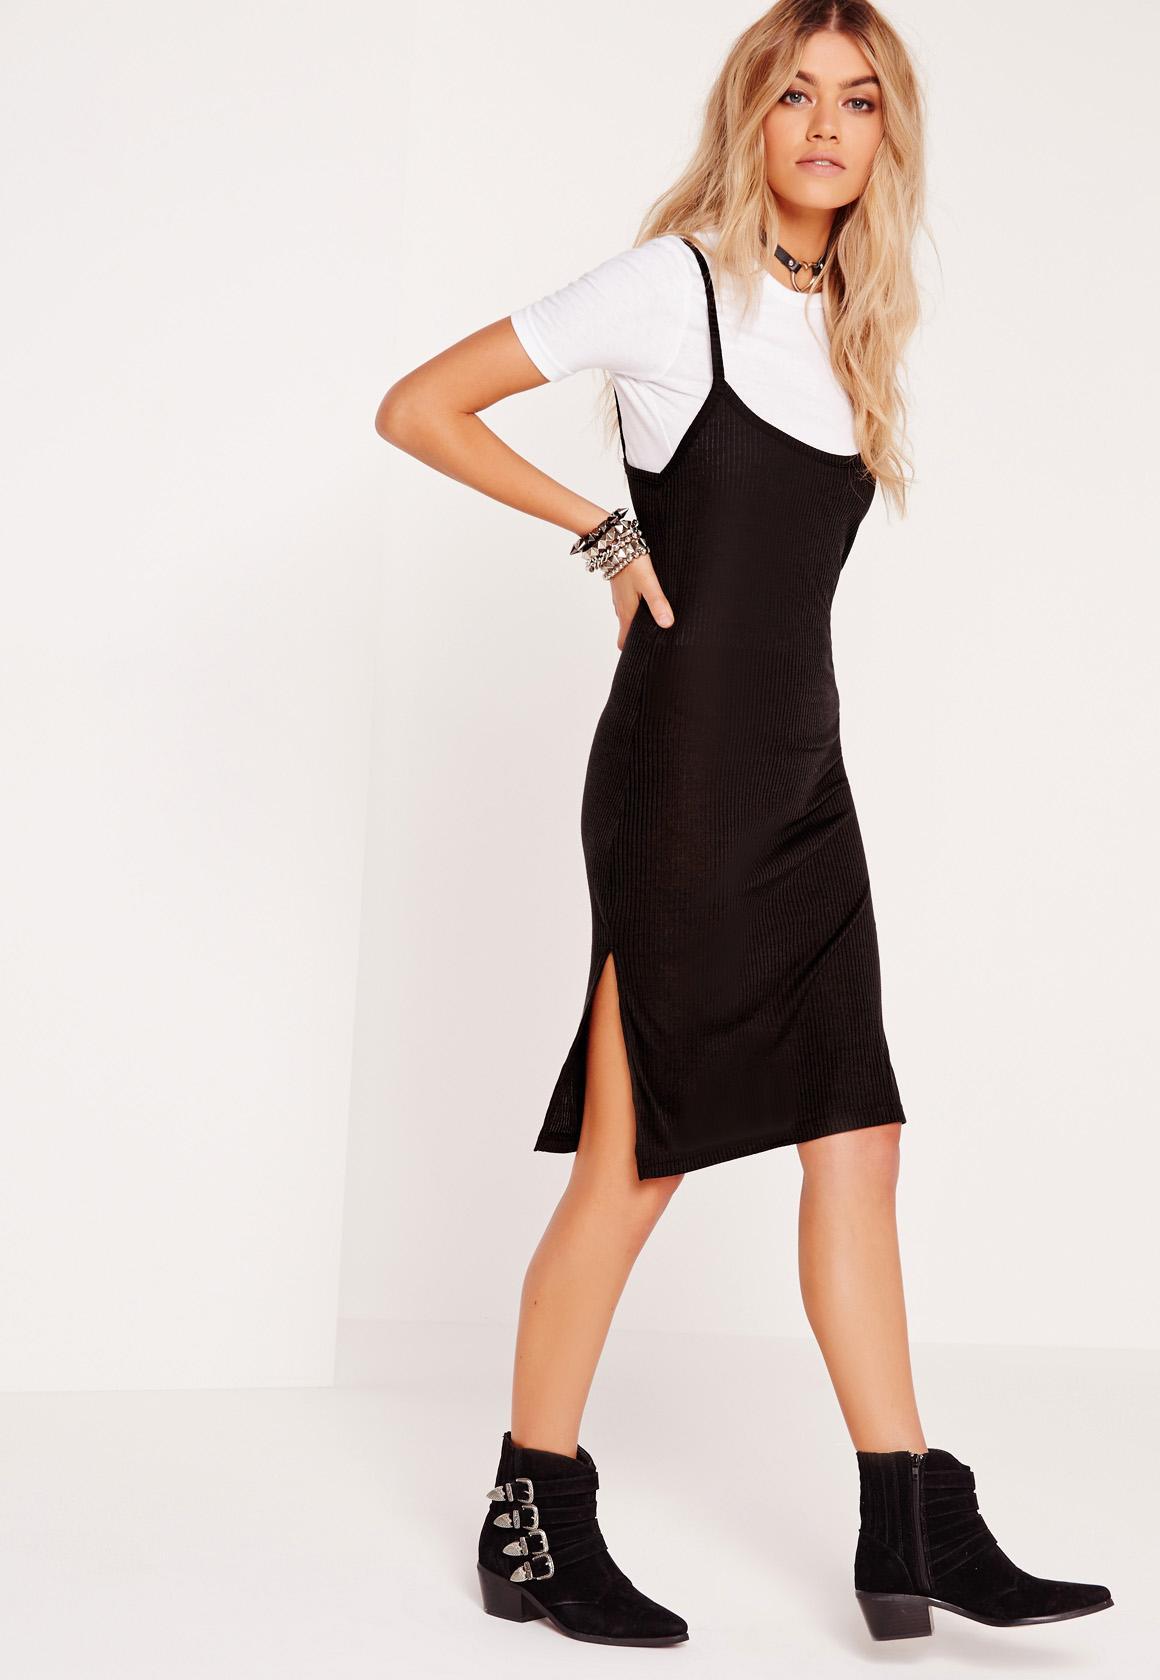 black-dress-tank-white-tee-layer-black-shoe-booties-blonde-fall-winter-weekend.jpg